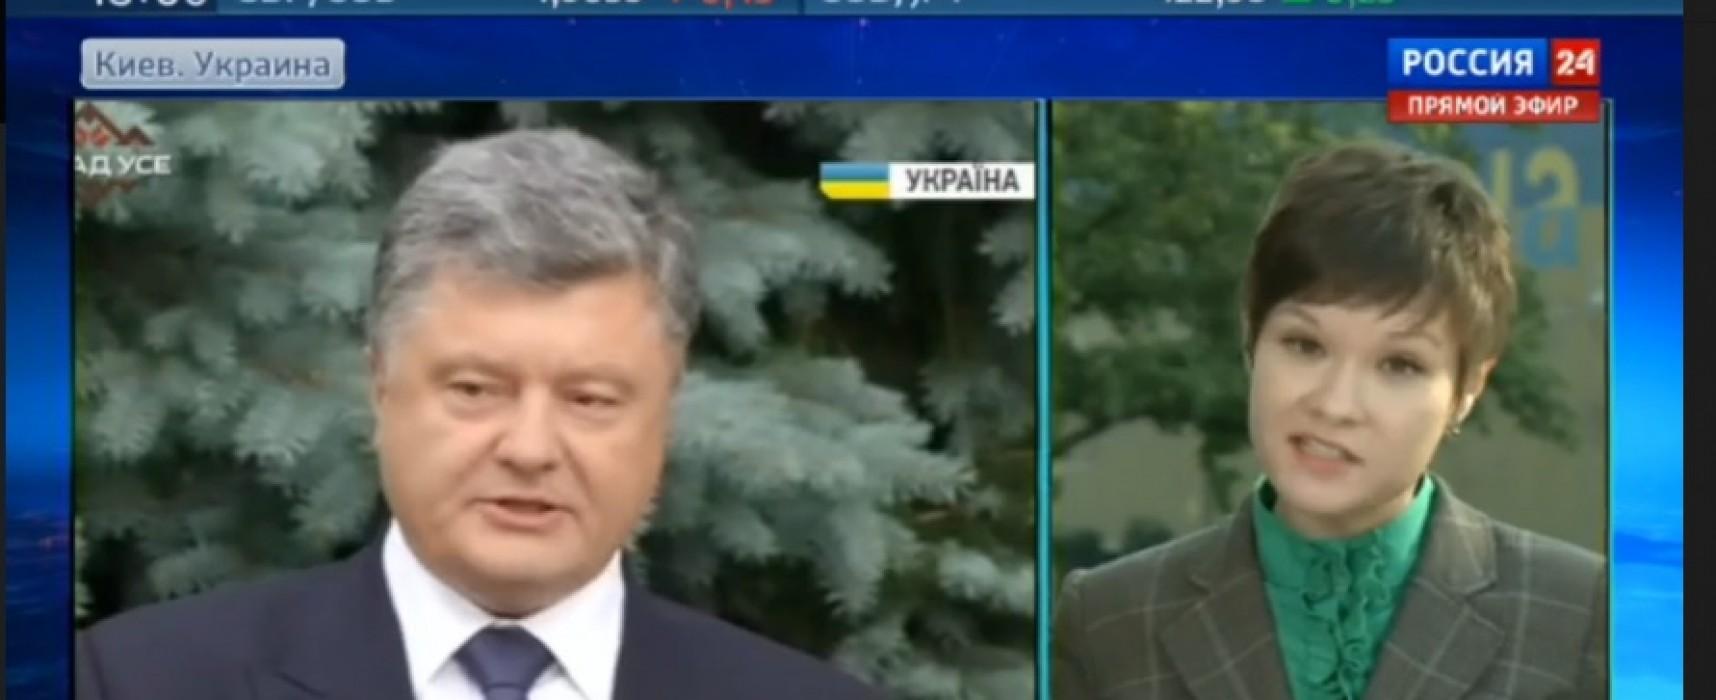 """Rusia 24"" desinformó sobre los poderes de Poroshenko"